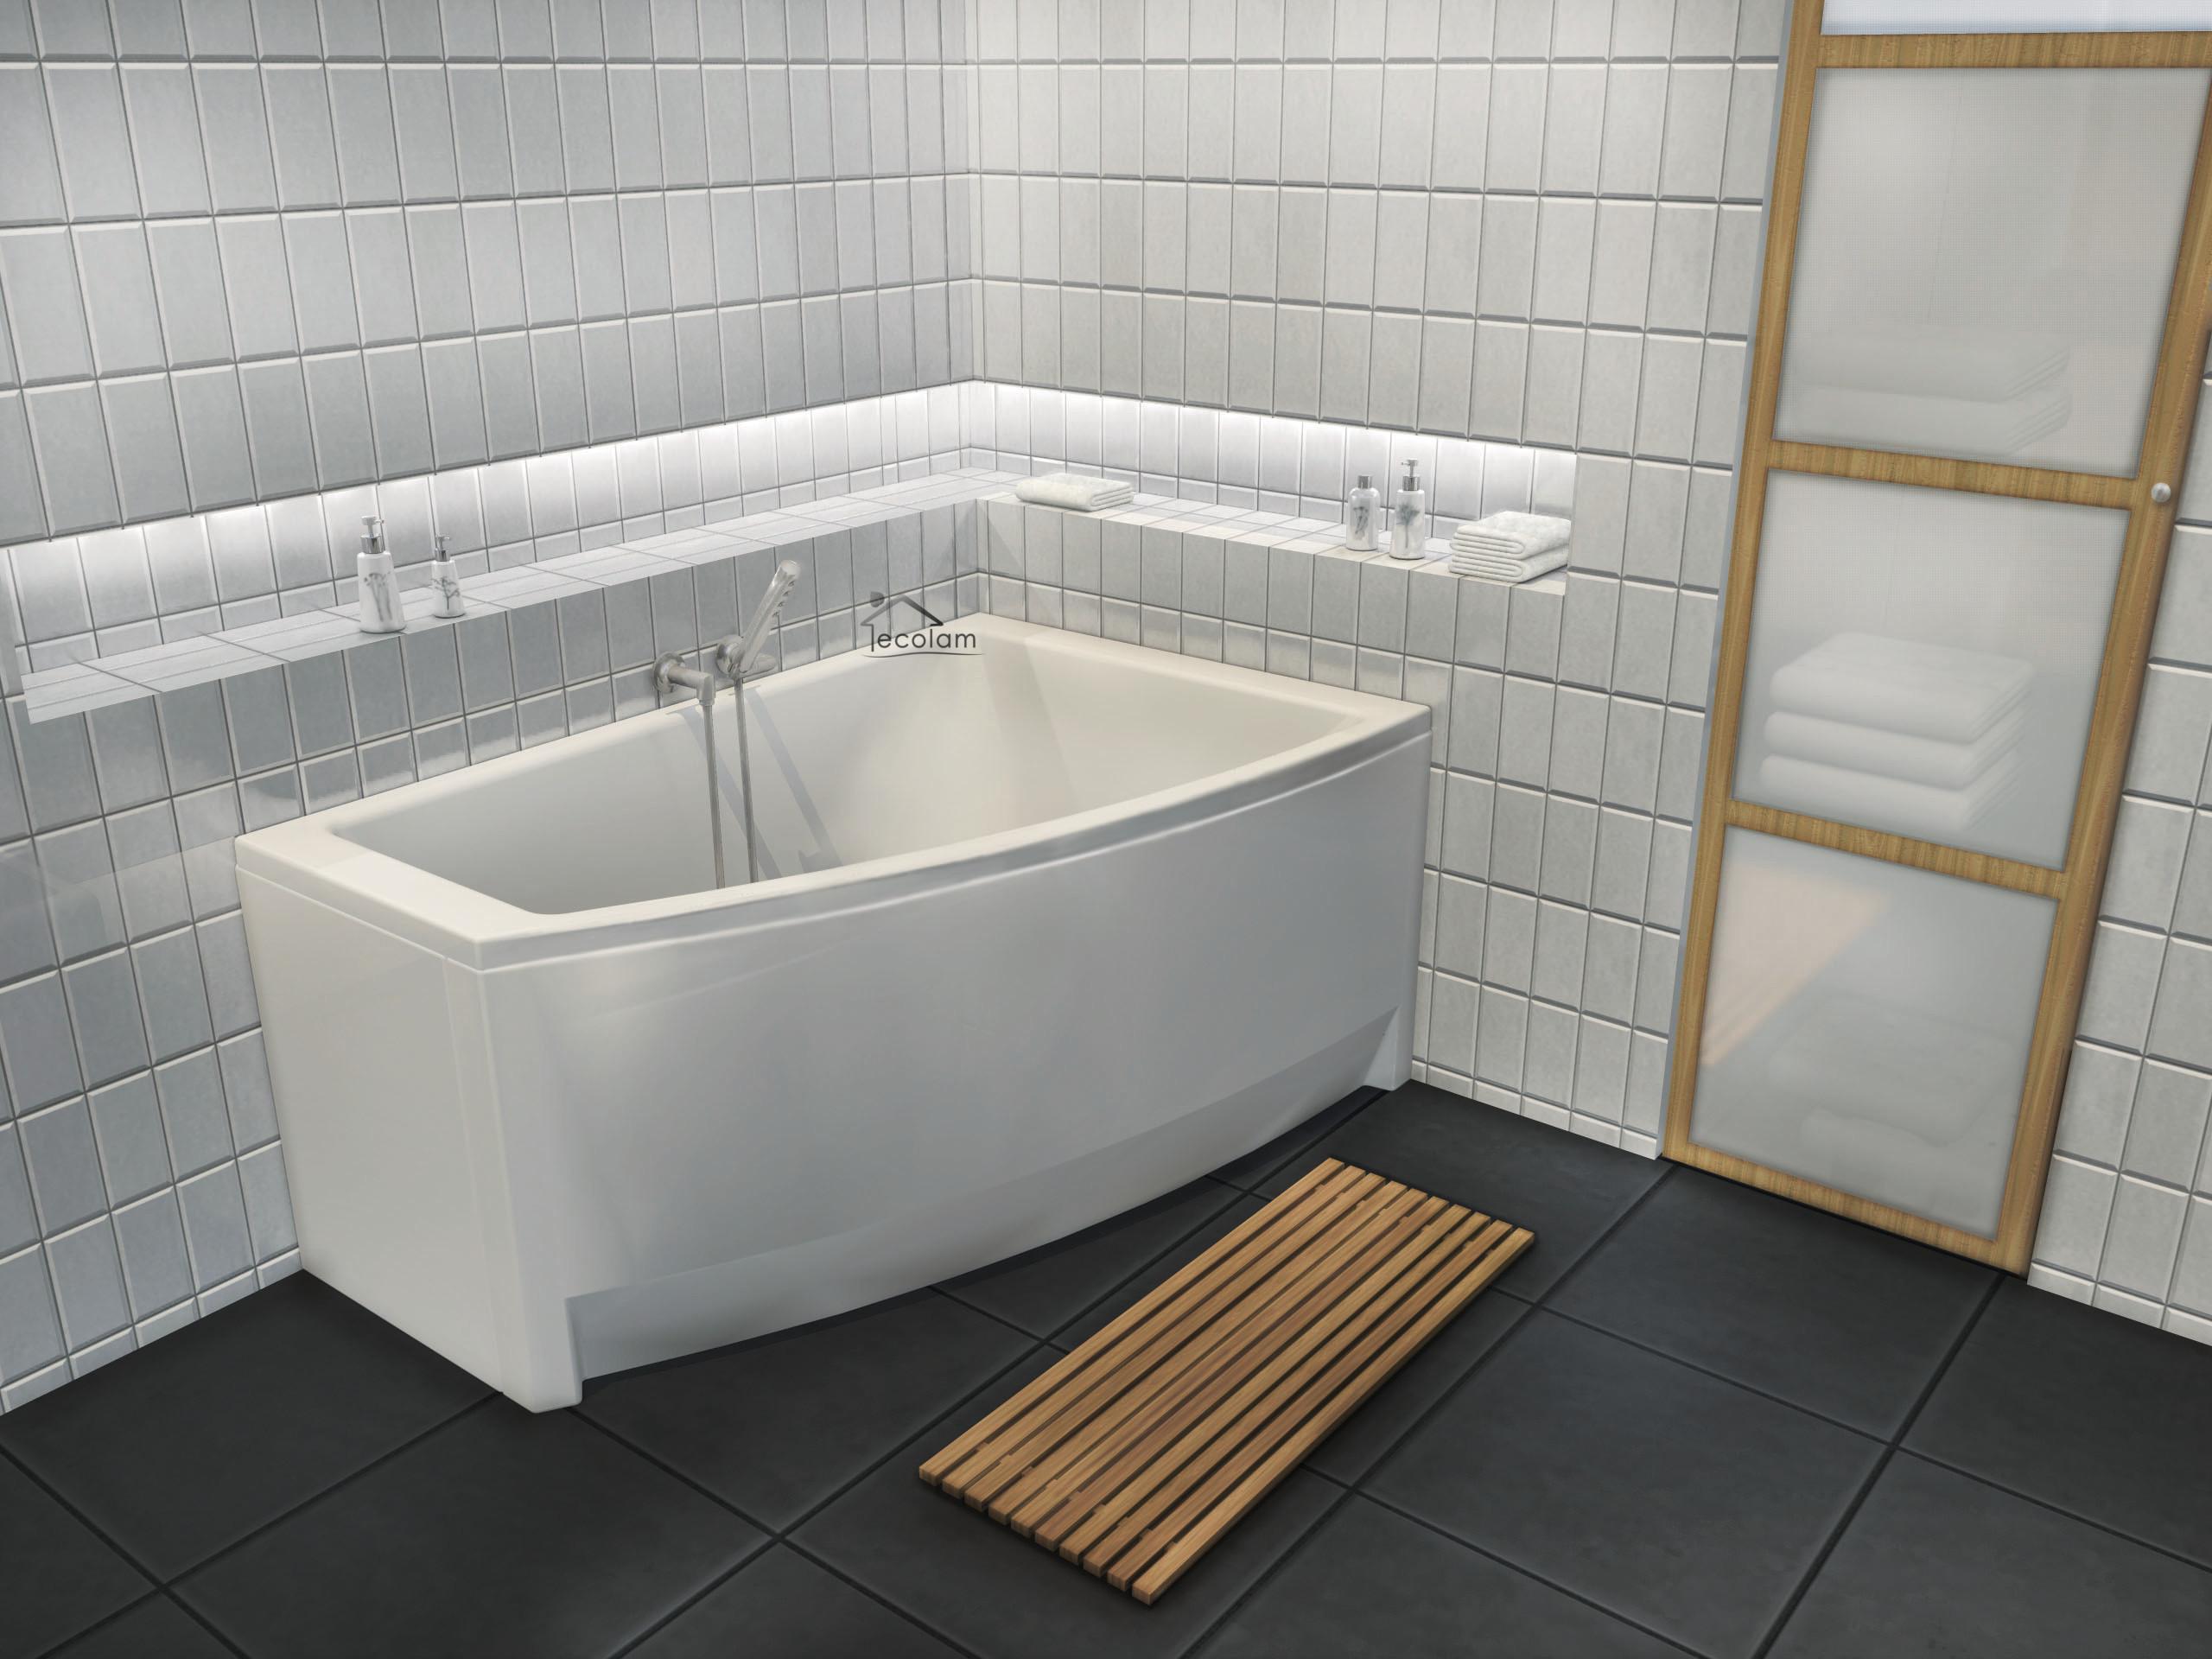 badewanne wanne eckbadewanne acryl 150x 90 cm f e sch rze. Black Bedroom Furniture Sets. Home Design Ideas